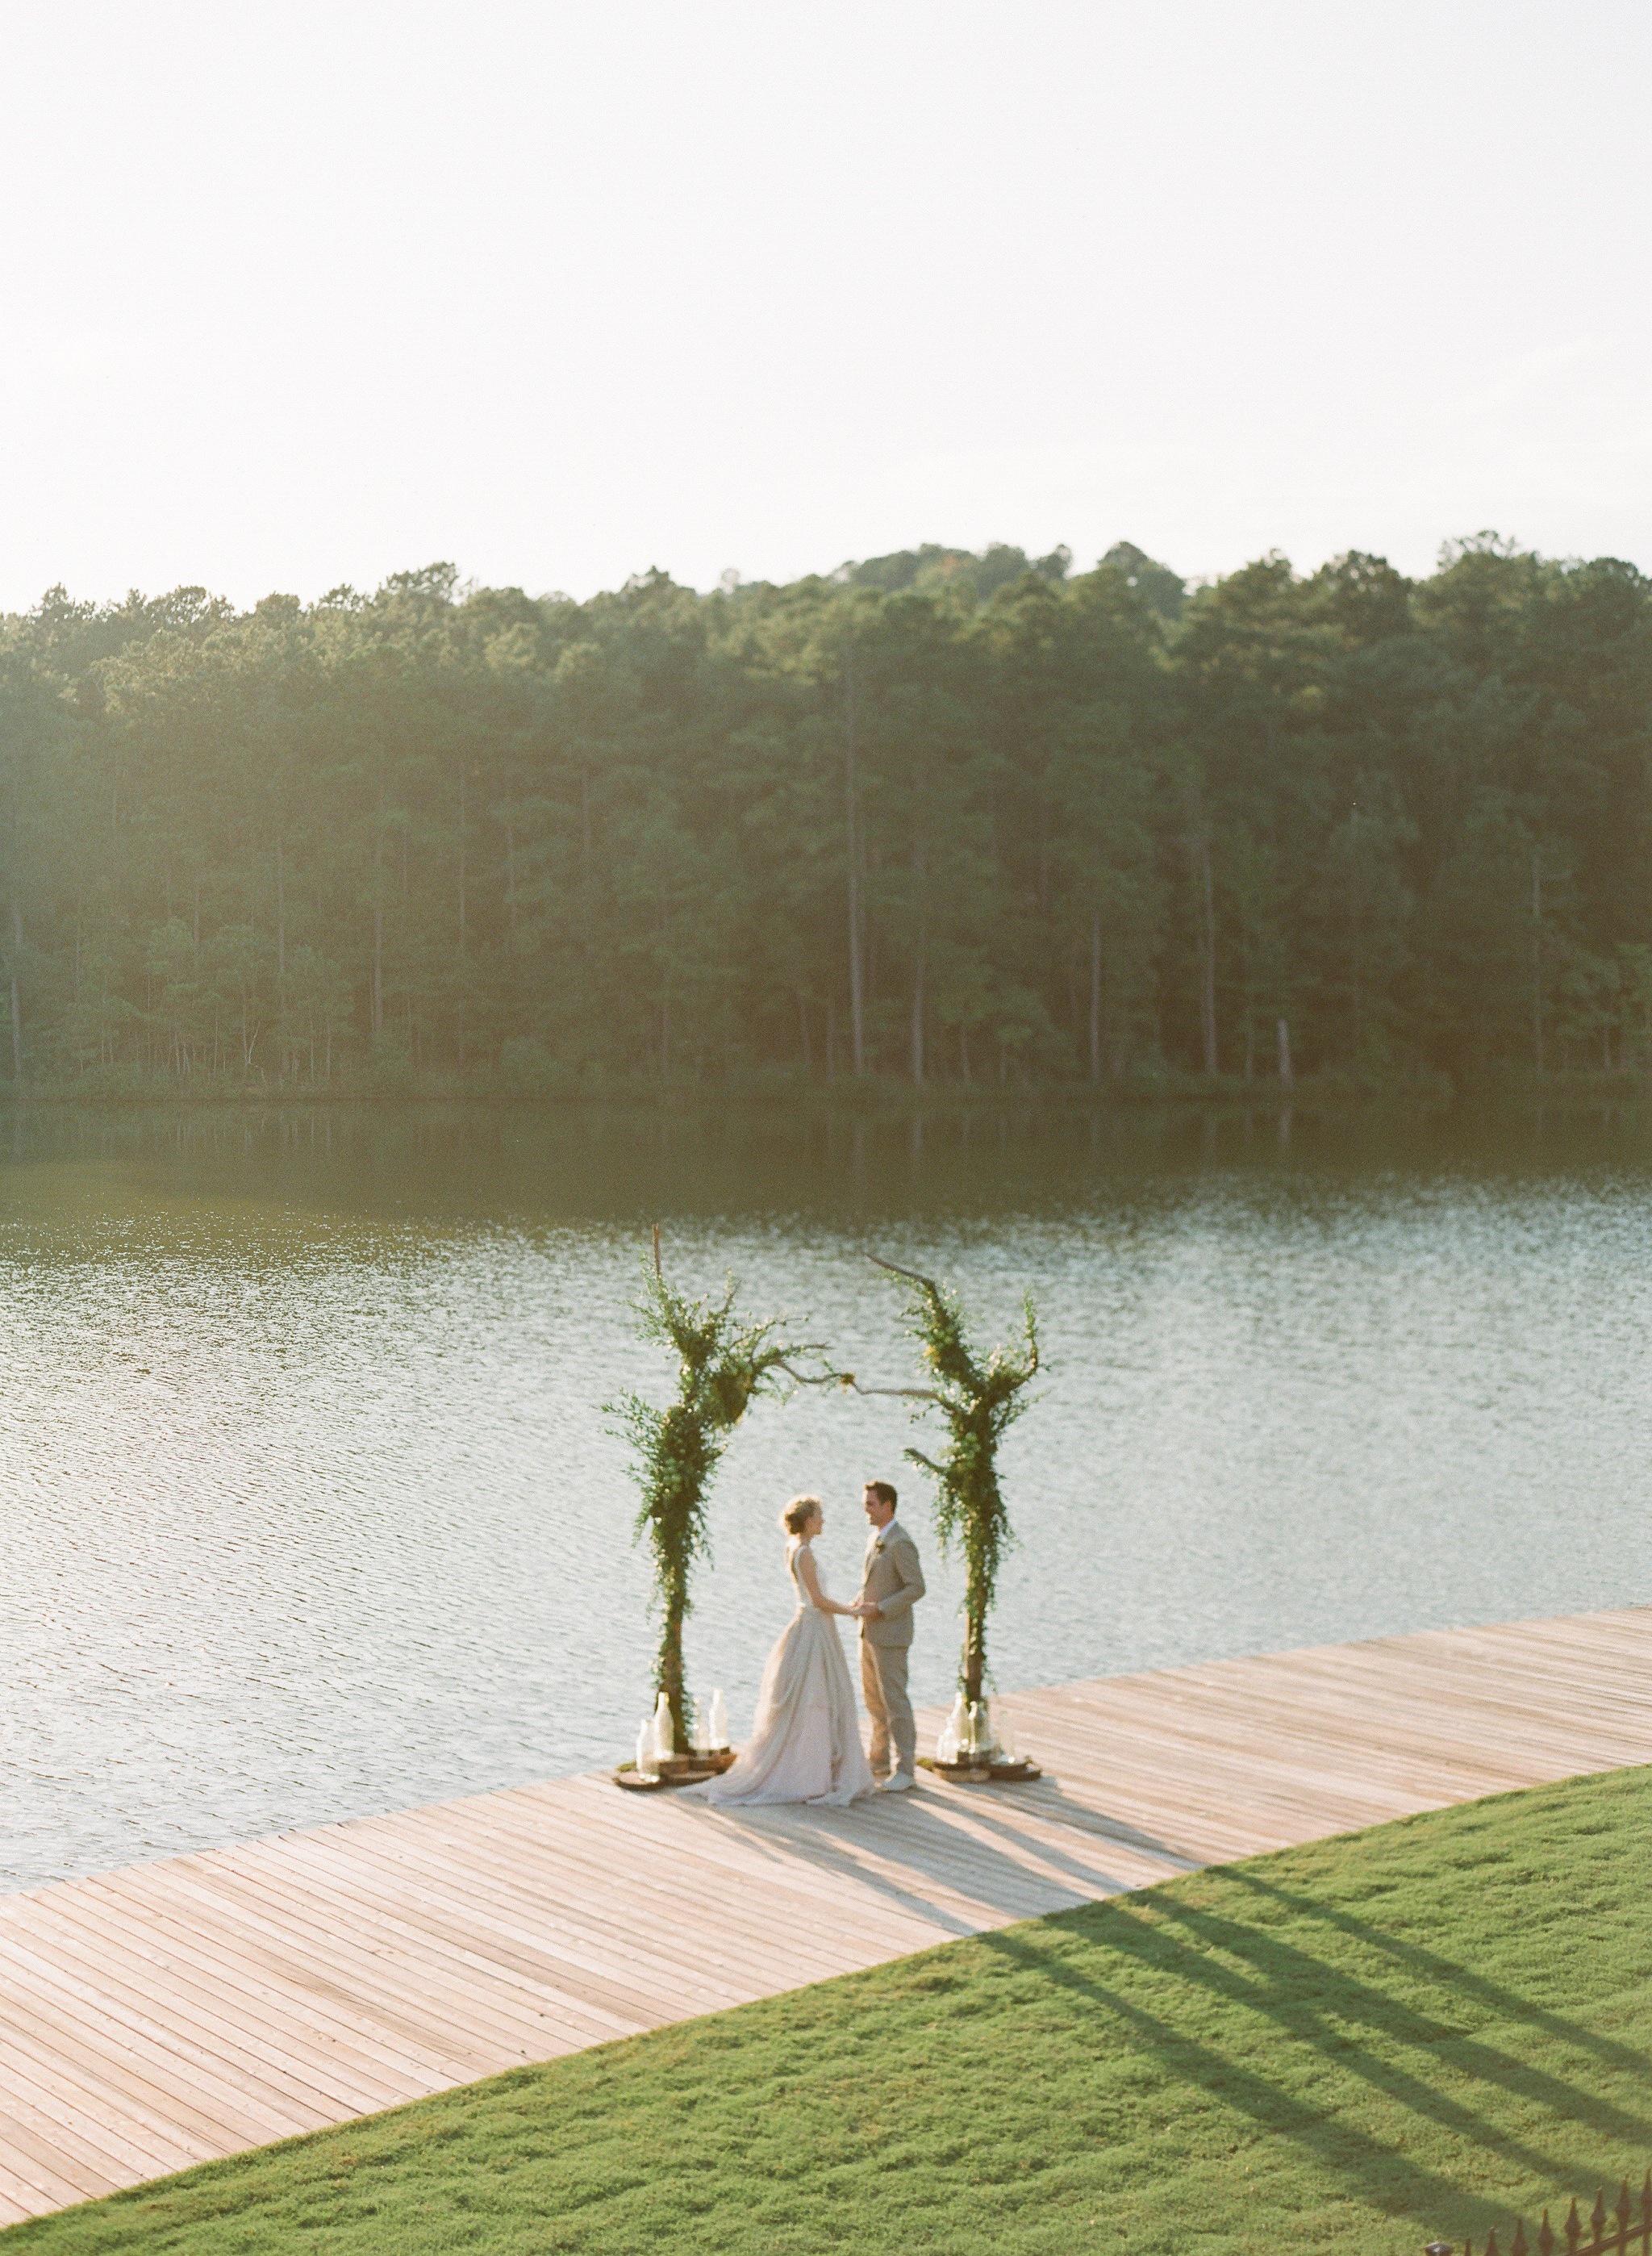 Simply-Charming-Socials_Atlanta-Wedding-Planner_Styled-Photo-Shoot_Modern-Luxury-Brides_Buffy-Dekmar-Photography_Ginny-Branch_Foxhall-Sporting-Club_23.jpg